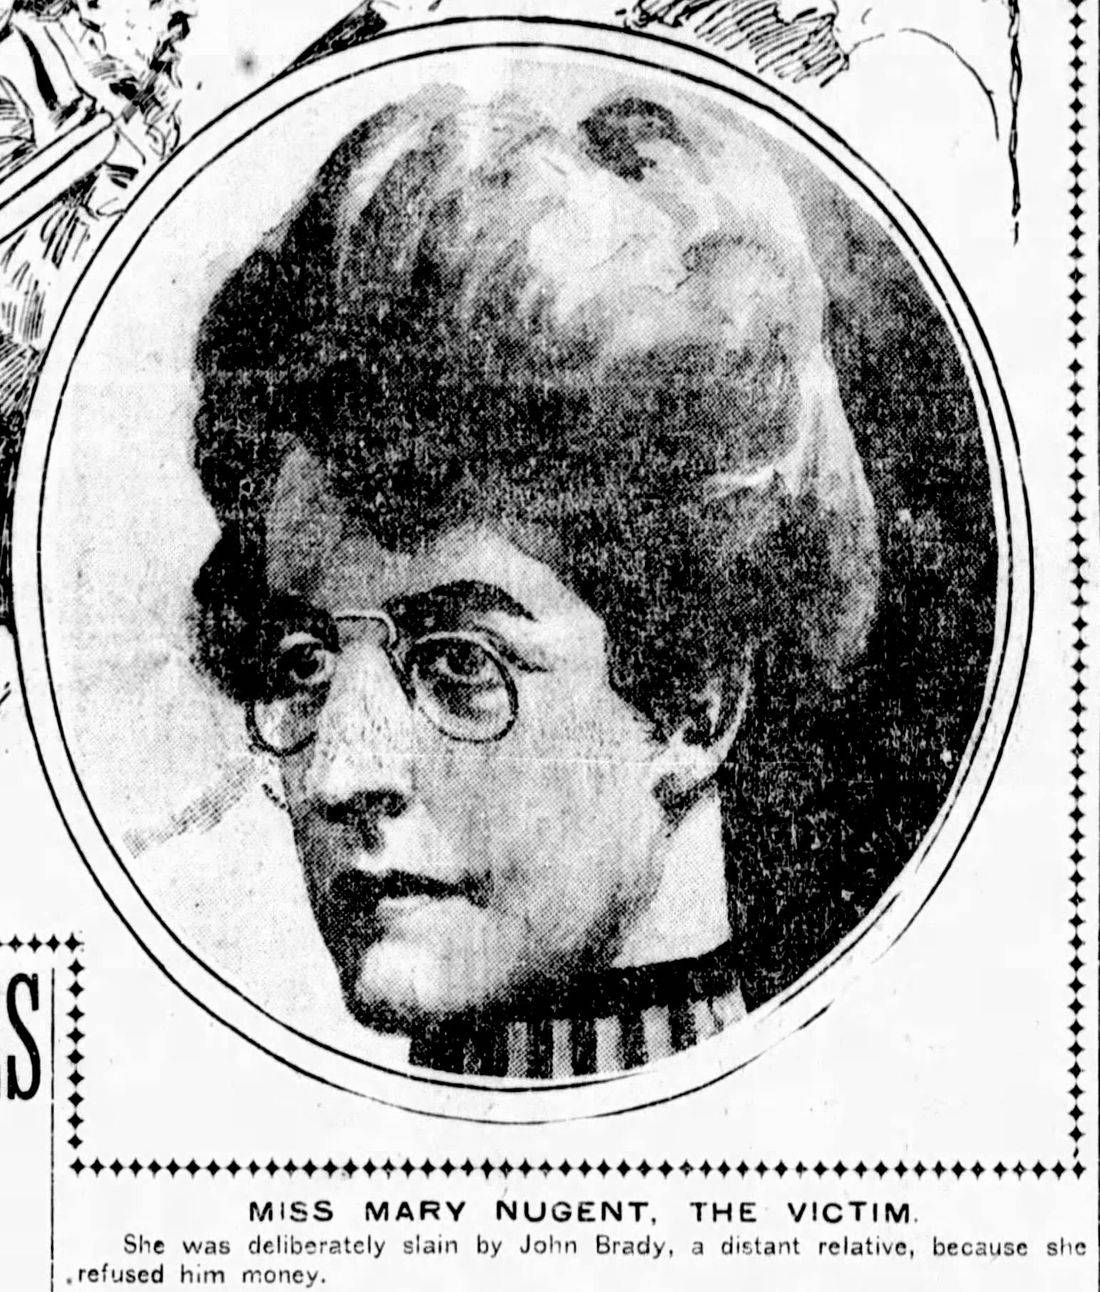 Murder victim Mary Nugent, ghost